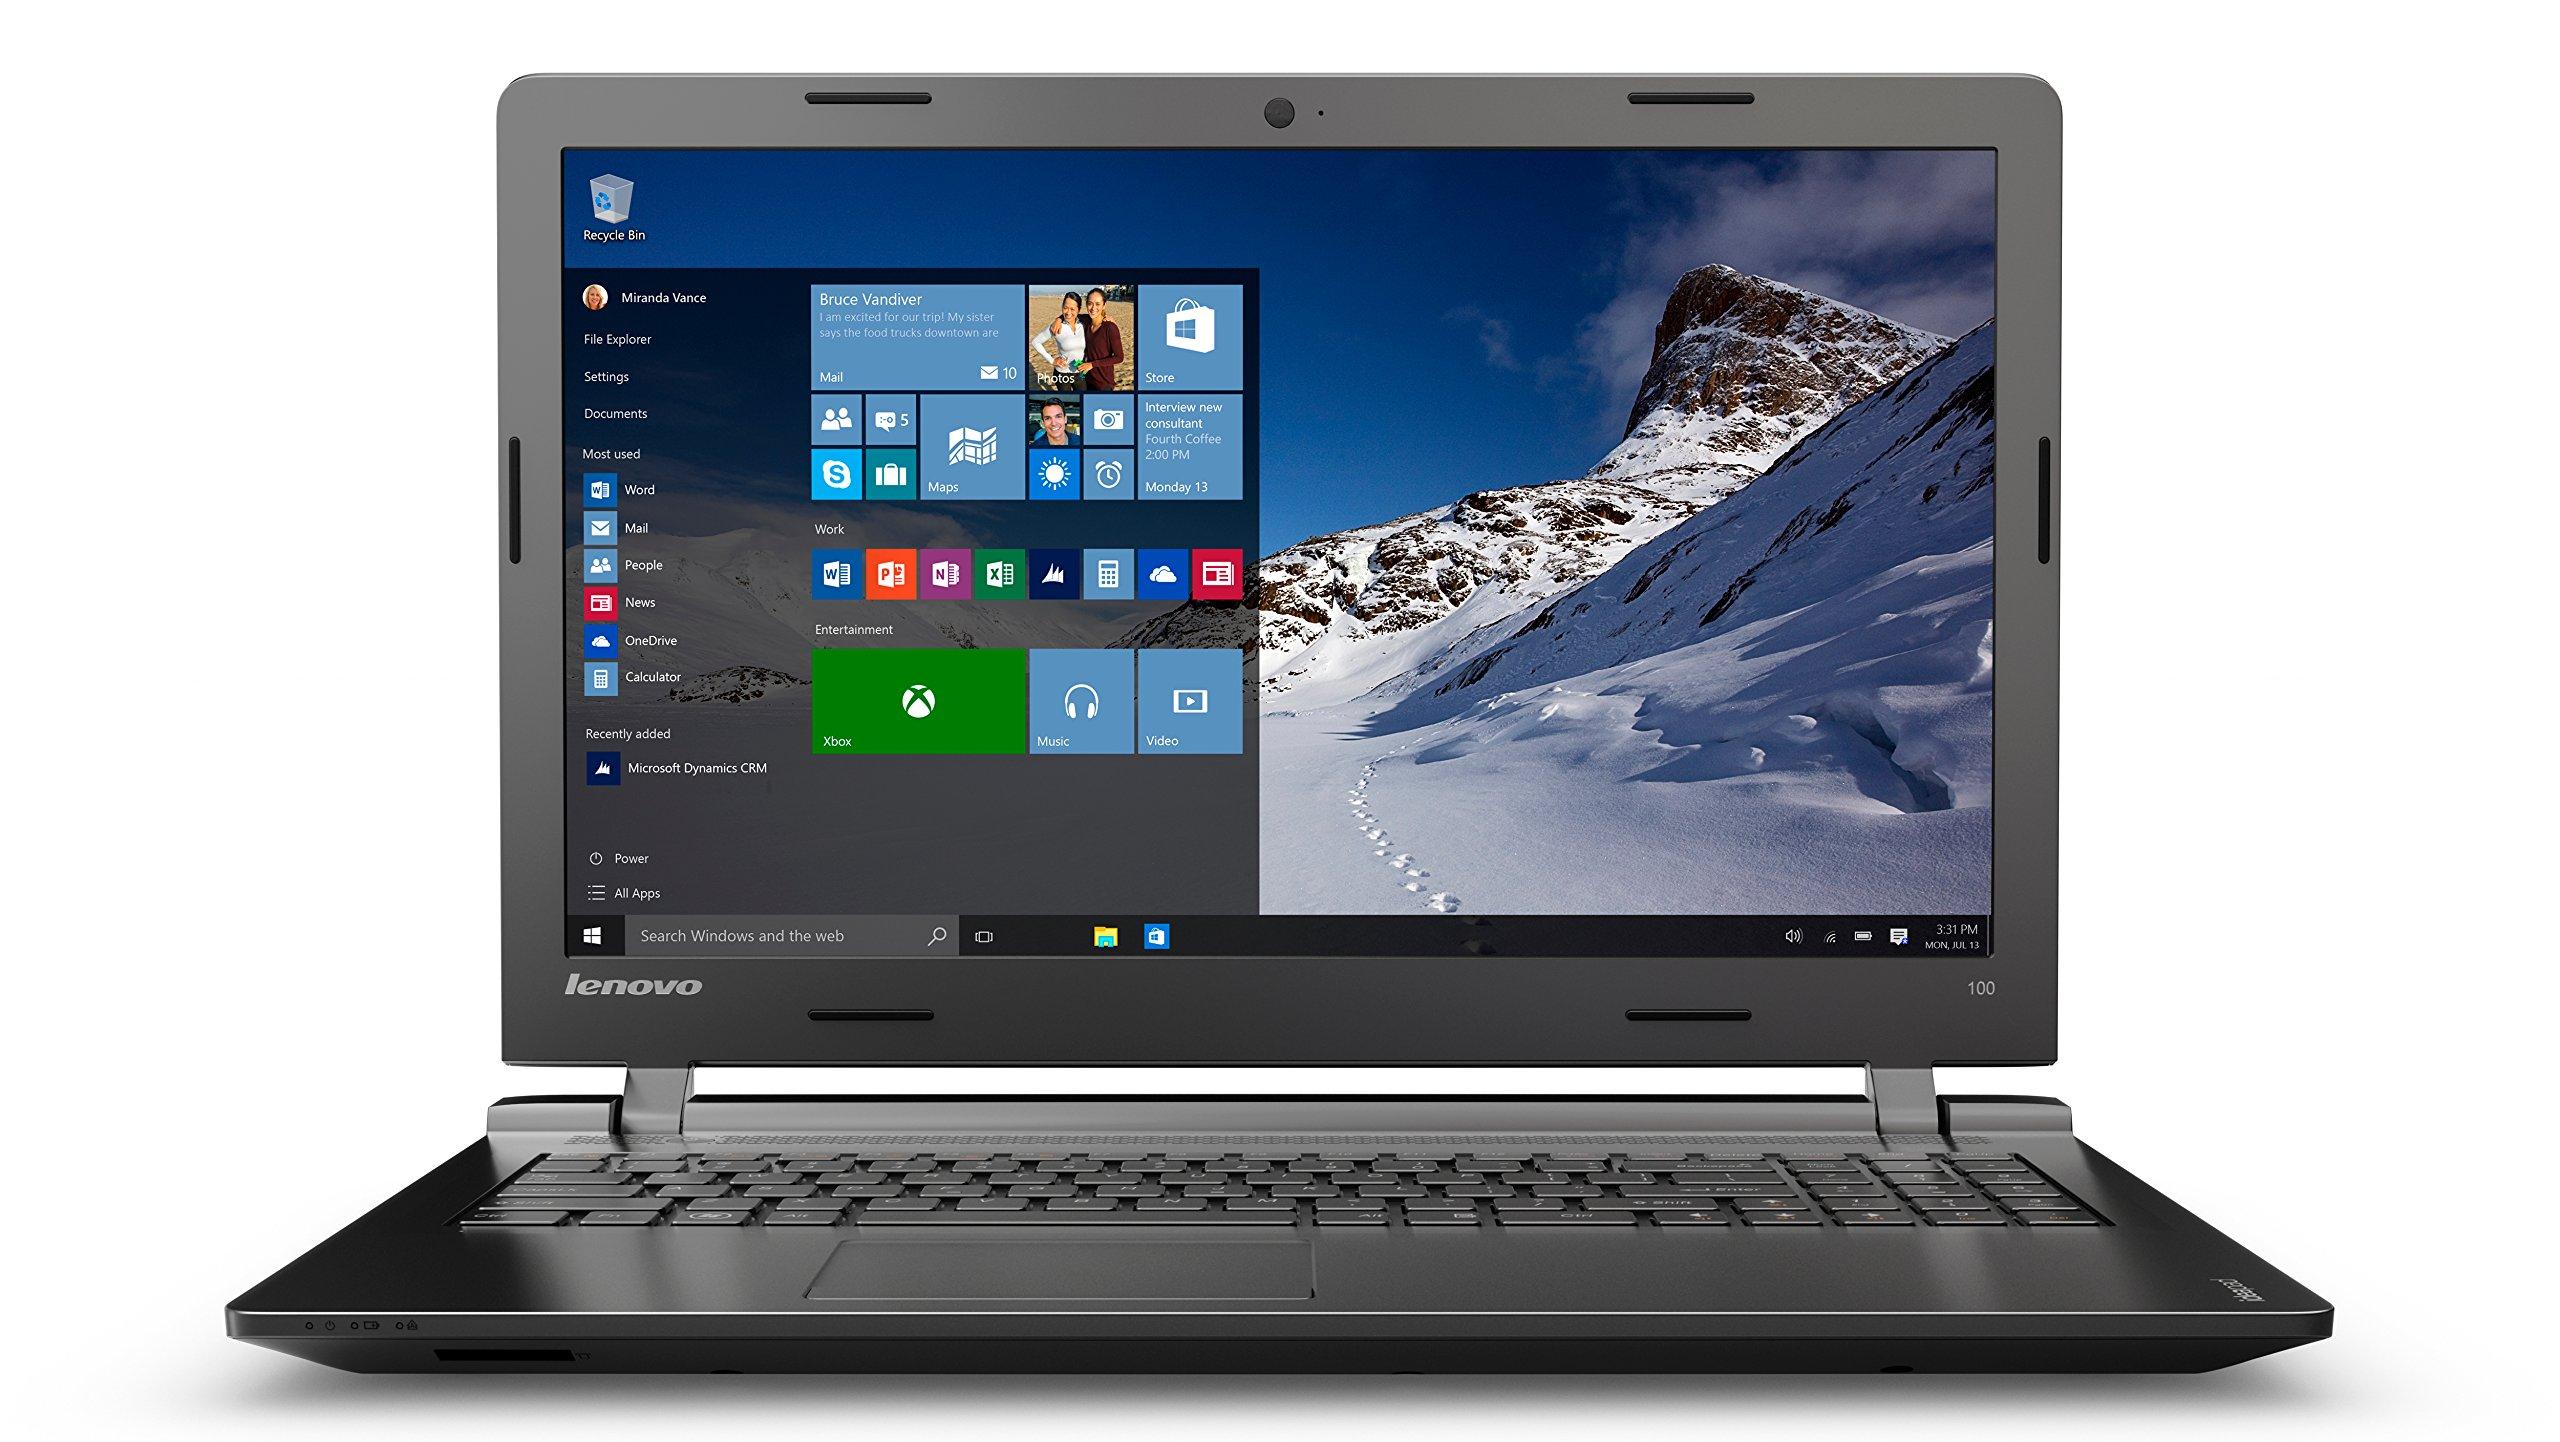 Lenovo IdeaPad 100 - Ordenador portátil Portátil, Negro, Concha, 802.11b, 802.11g, 802.11n, Intel Pentium, DDR3L-SDRAM, Teclado QWERTZ Alemán: Amazon.es: ...